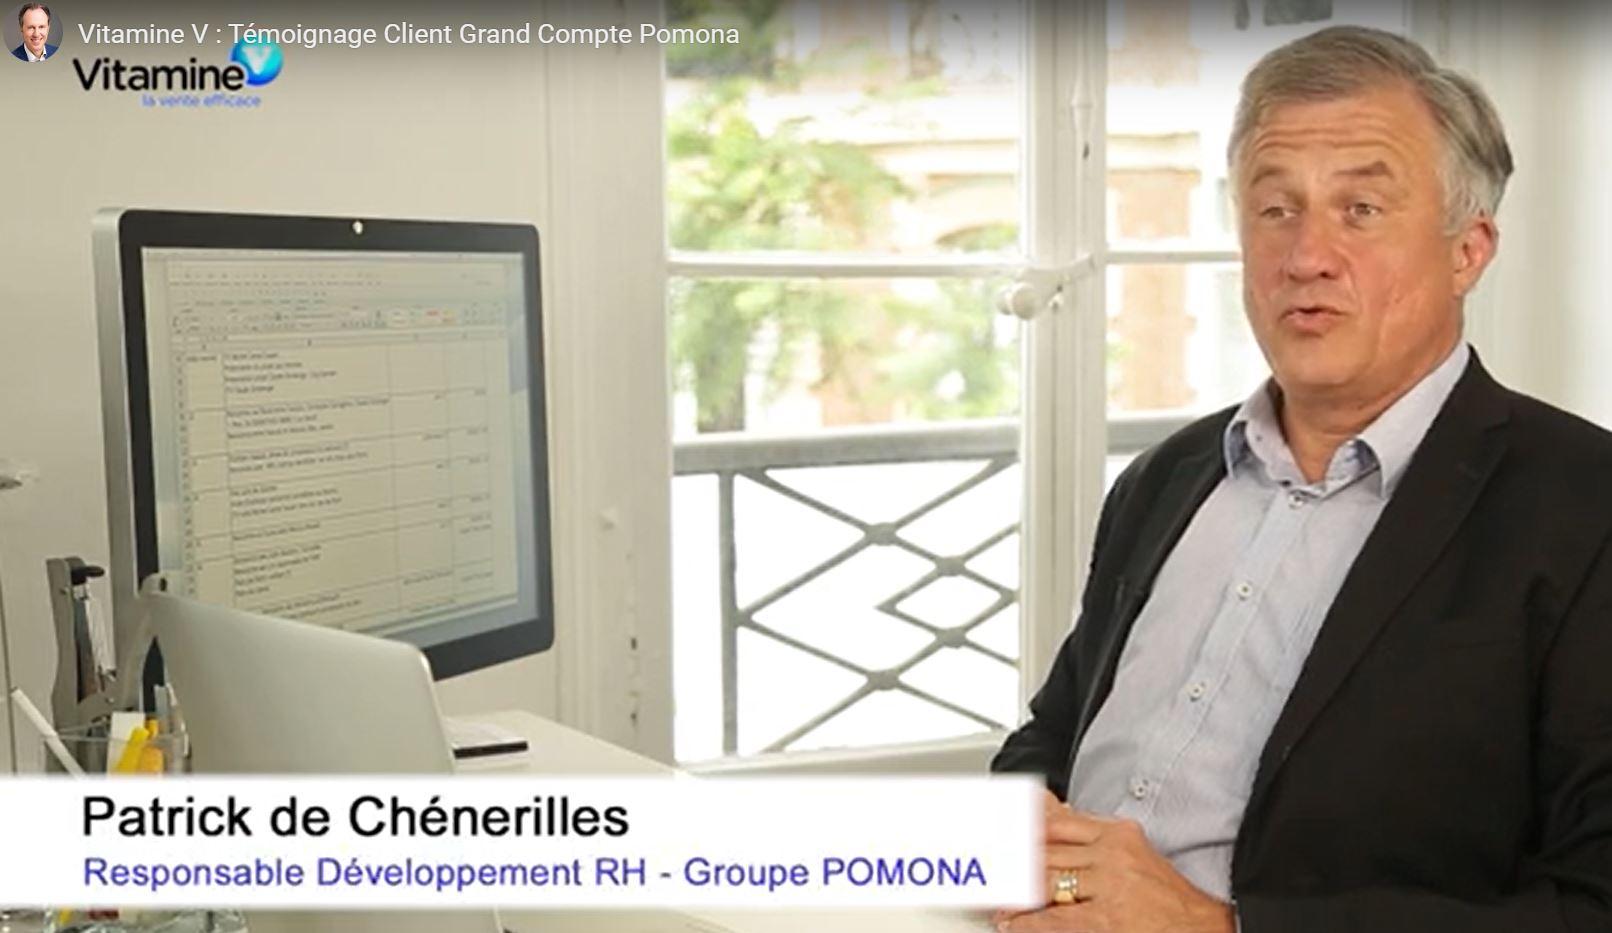 Formateur vente pour Pomona, grand compte national